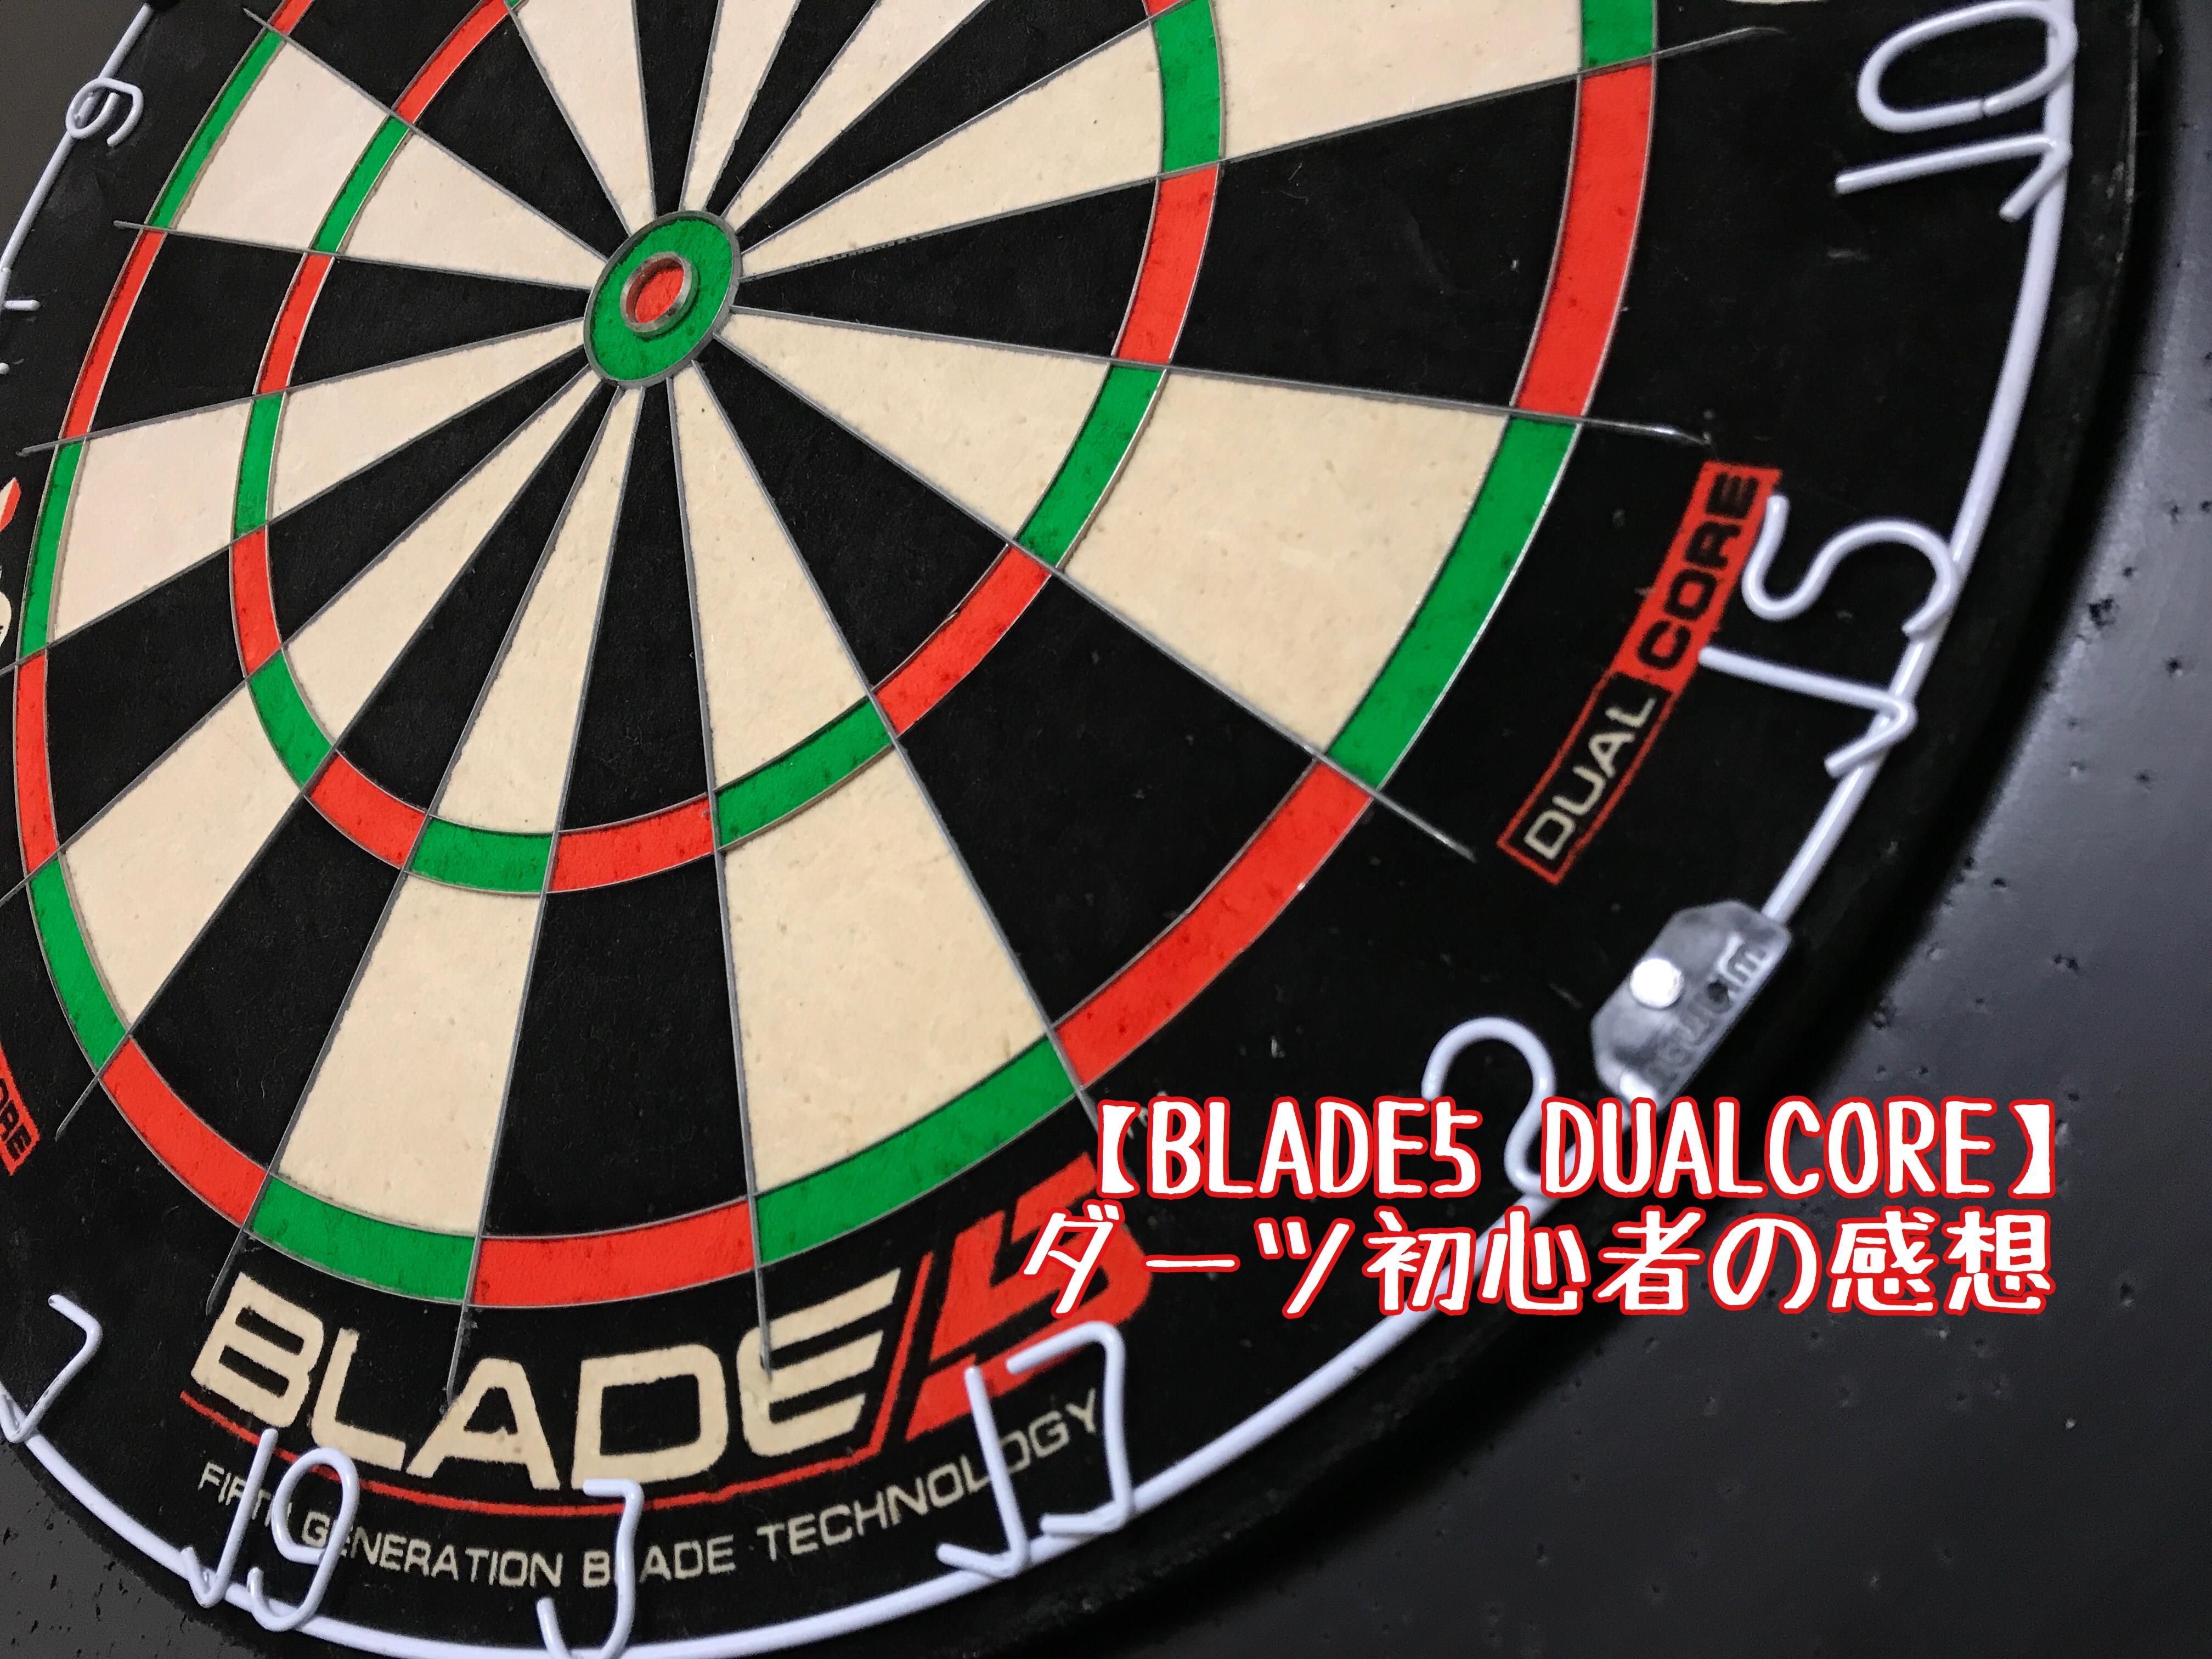 BLADE5 DUALCORE